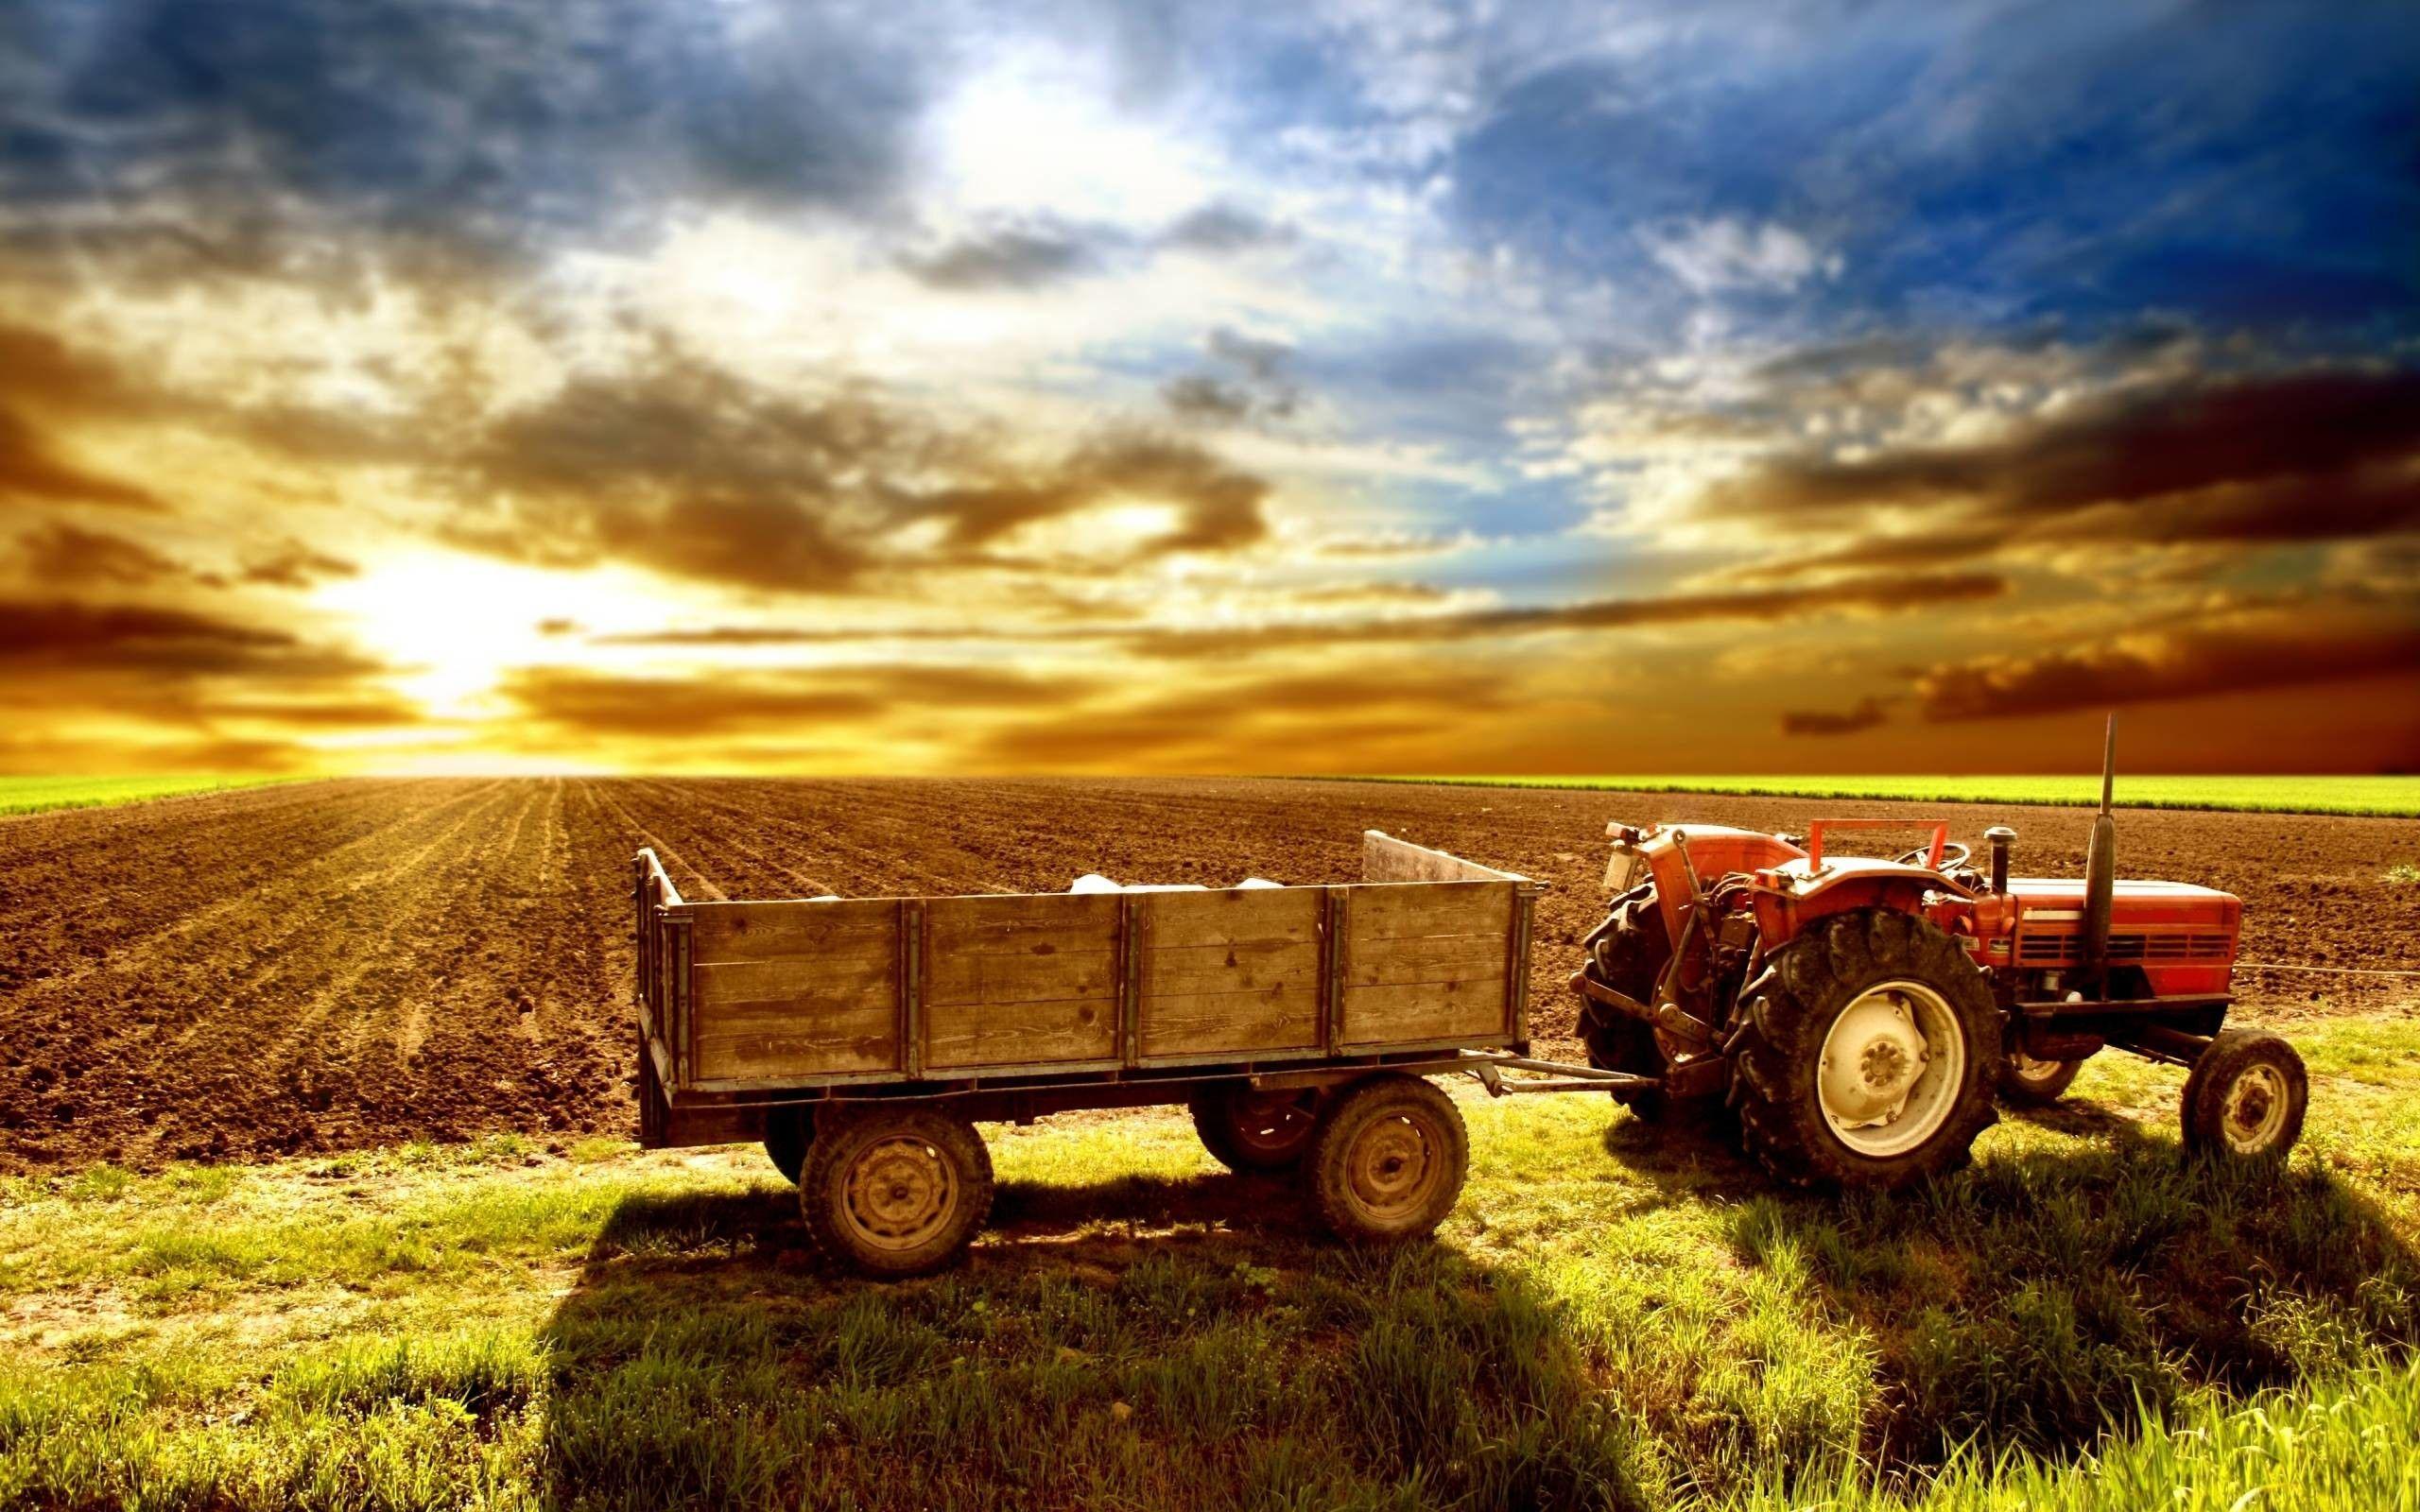 Farmer Wallpapers   Top Farmer Backgrounds   WallpaperAccess 2560x1600